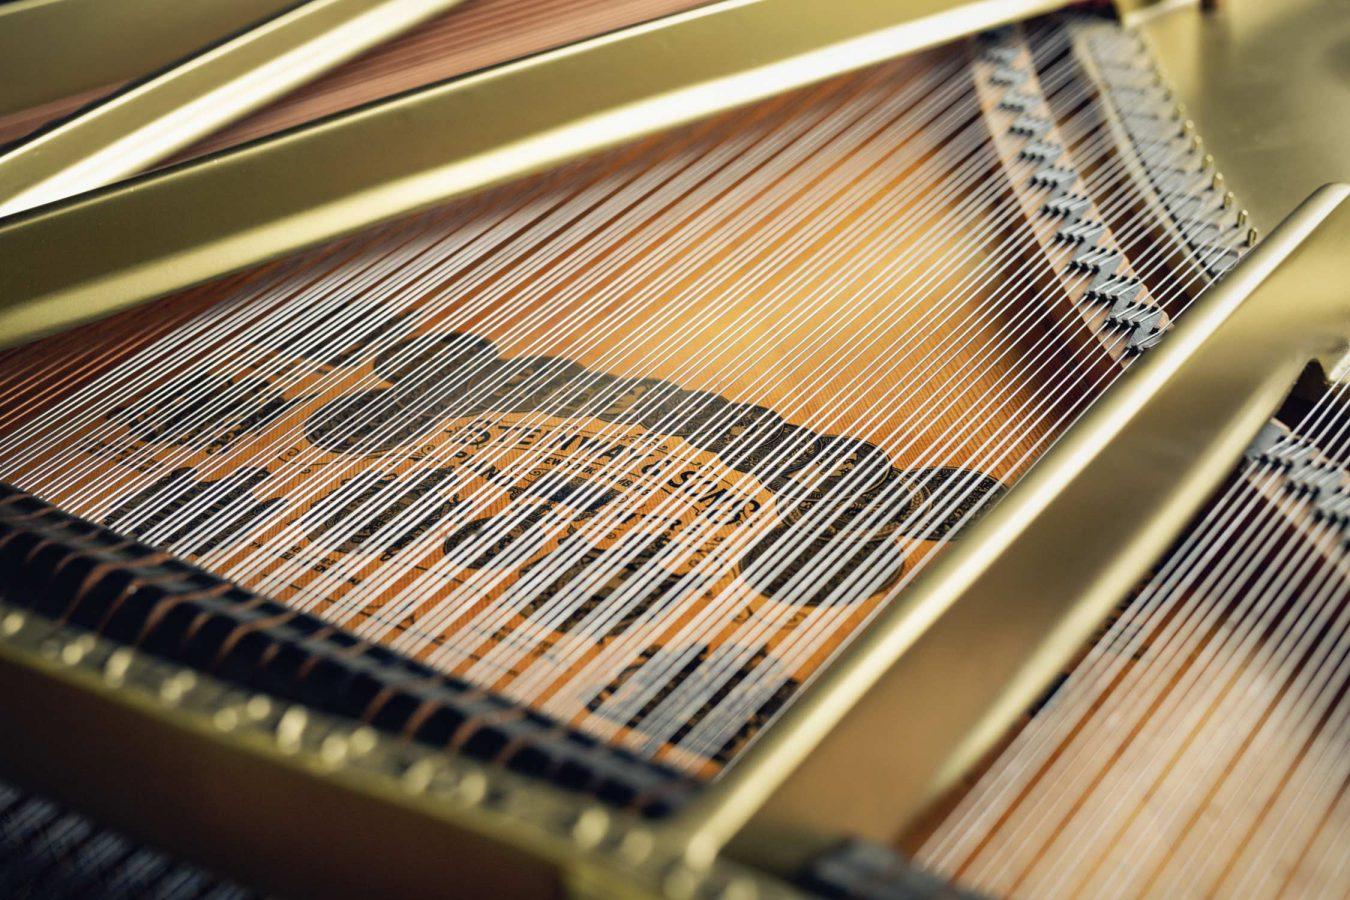 cambridge-pianoforte-editorial-photography-steinway